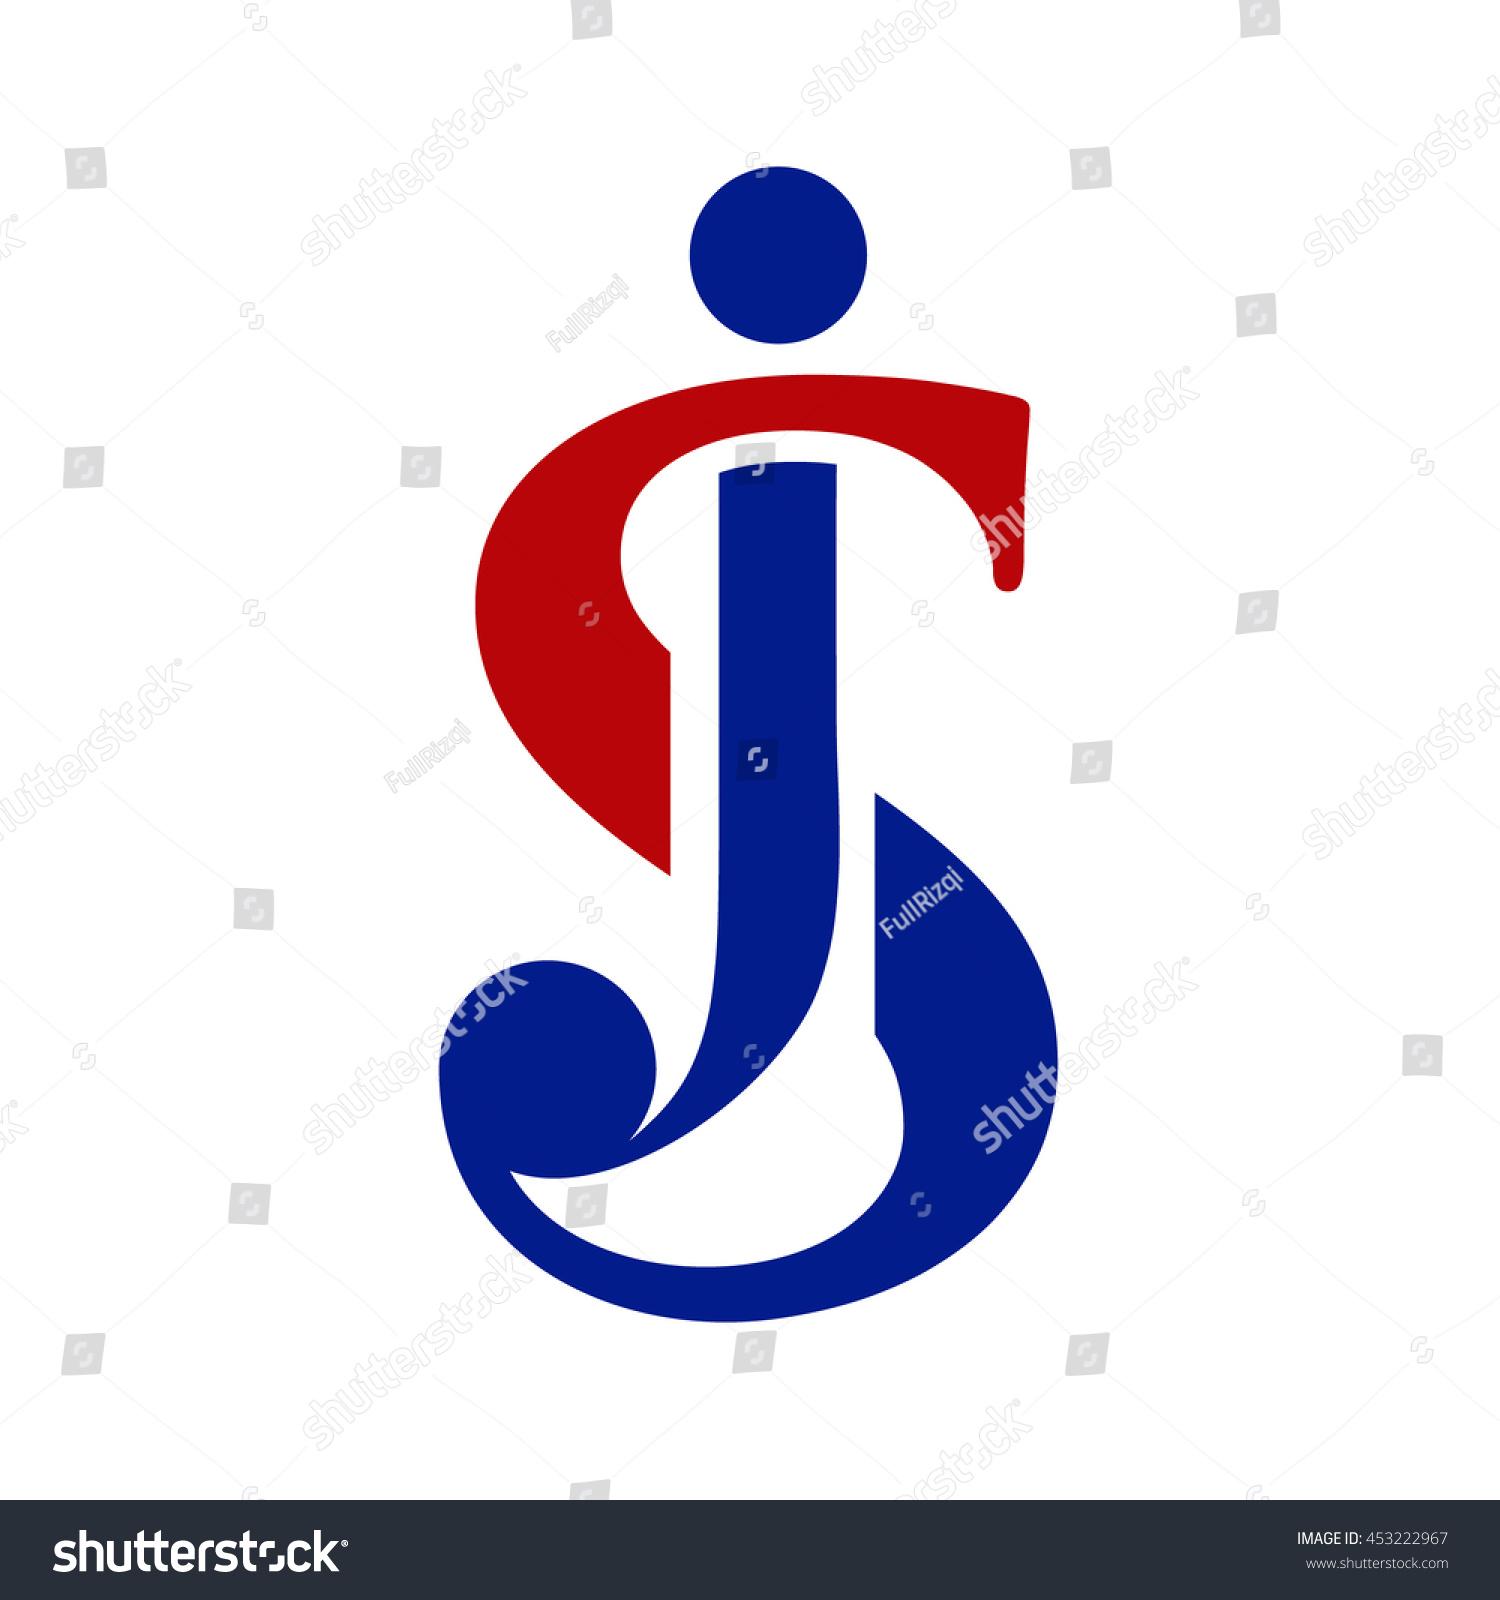 Sj Initial Logo Js Initial Logo Stock Vector 453222967 ...